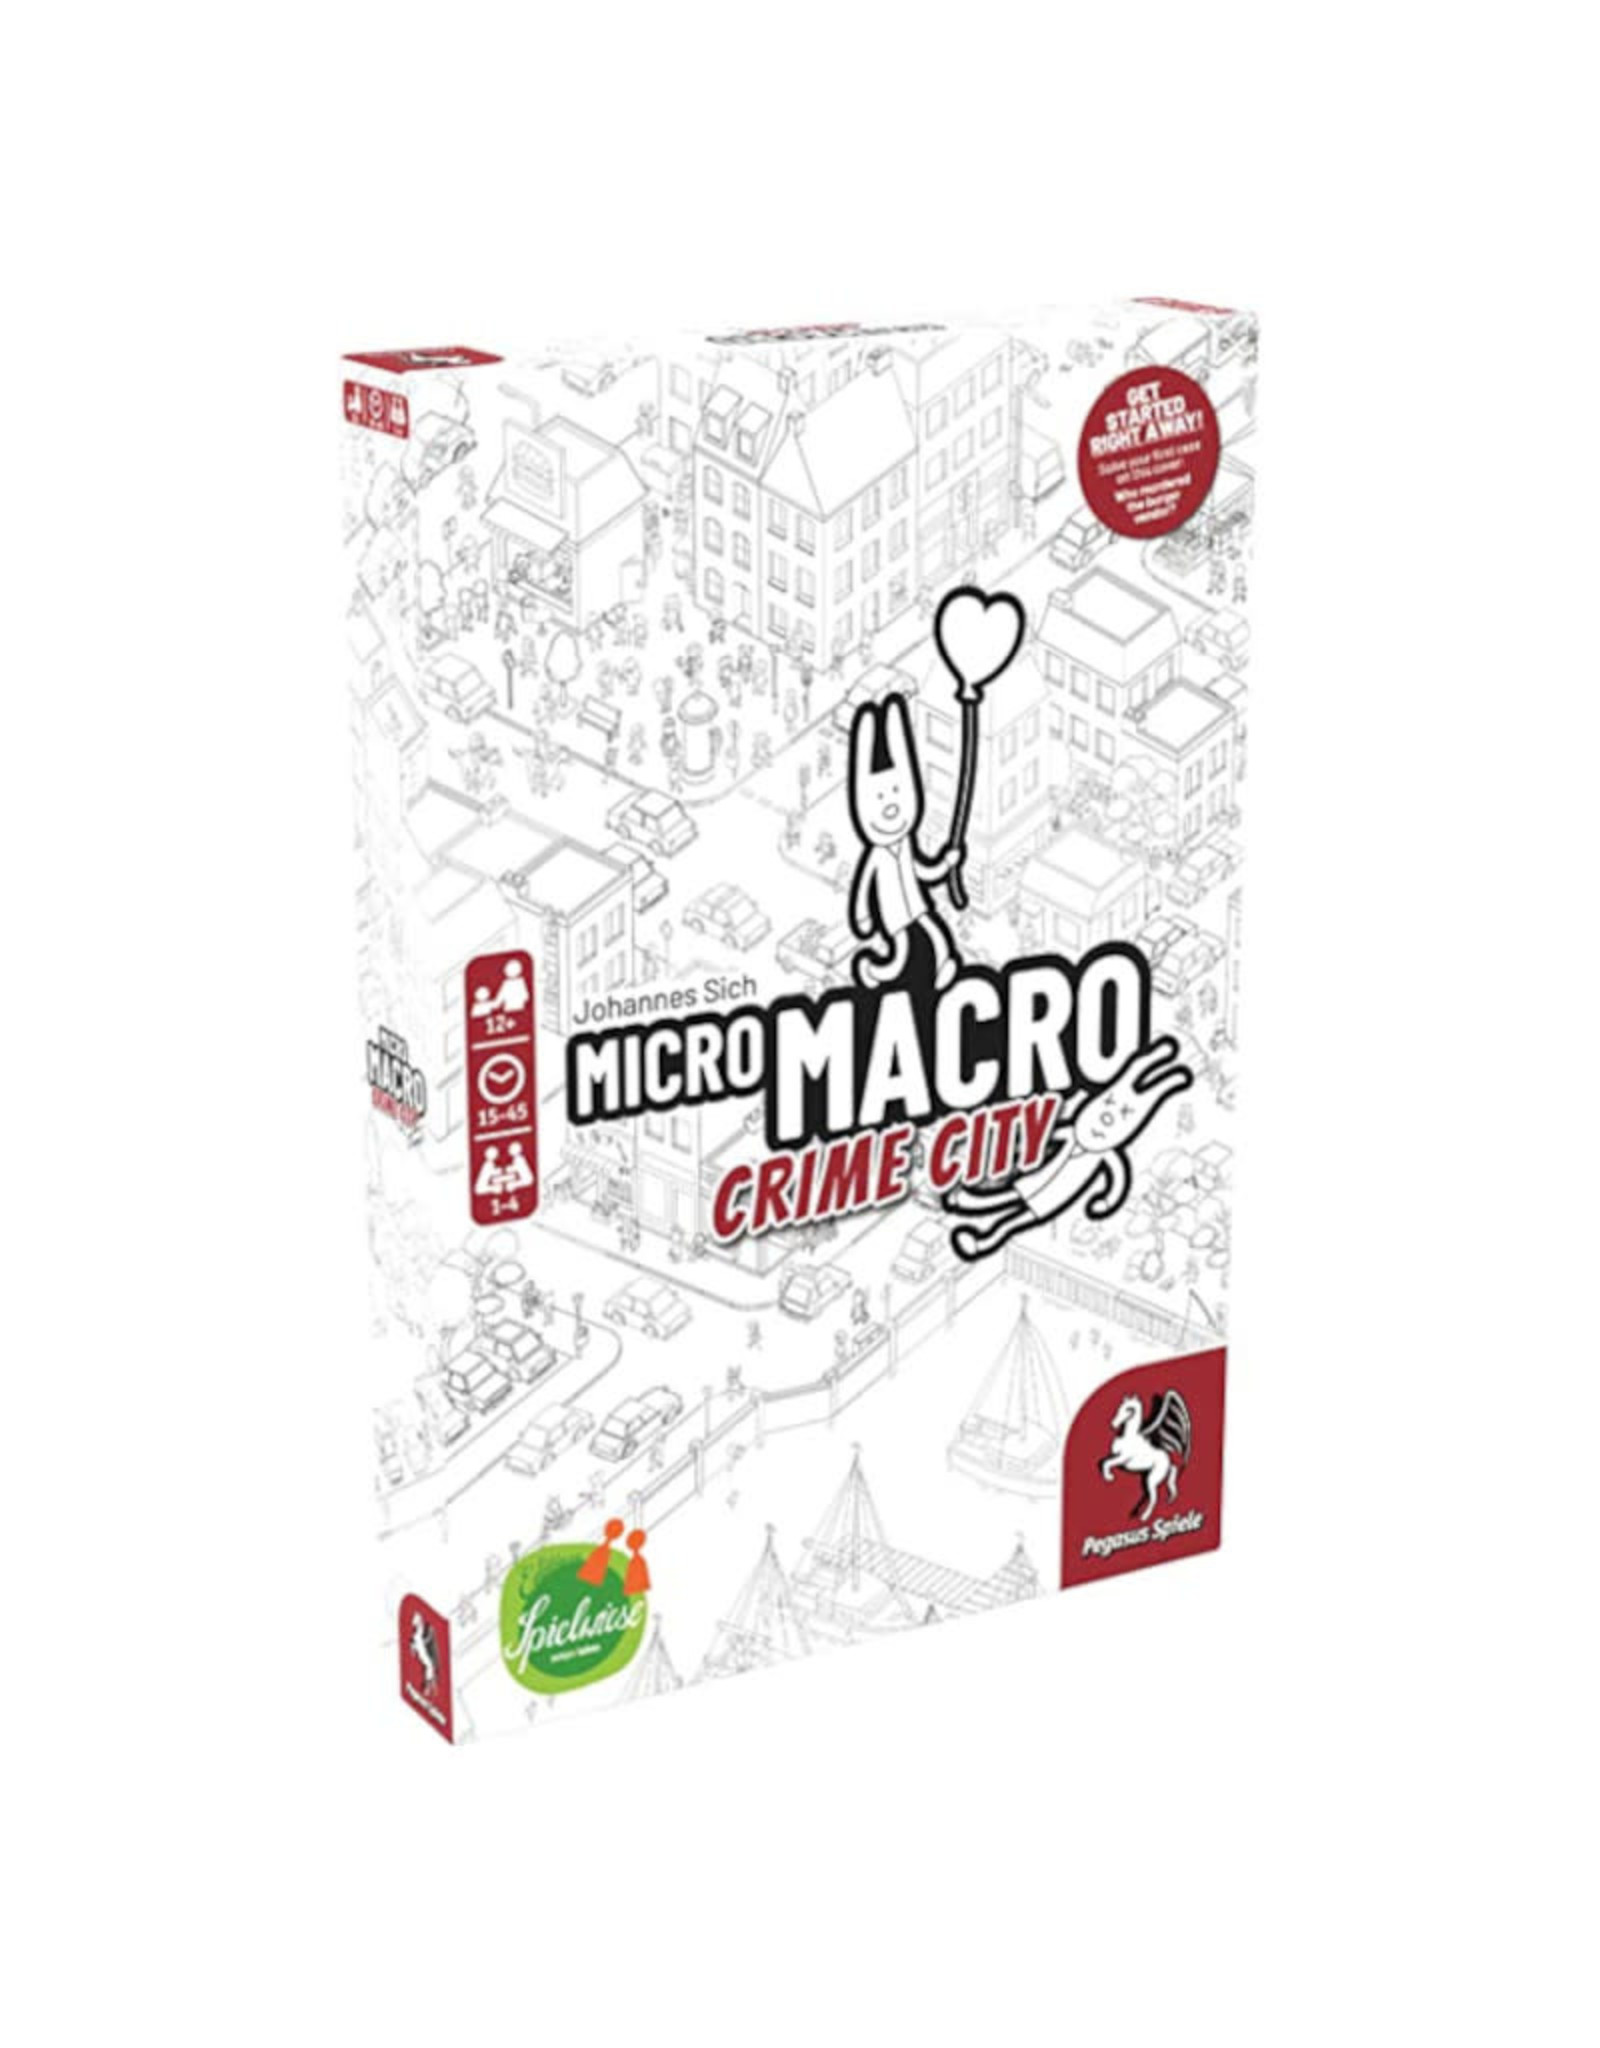 Pegasus Spiele (Reprint May 2021) MicroMacro: Crime City